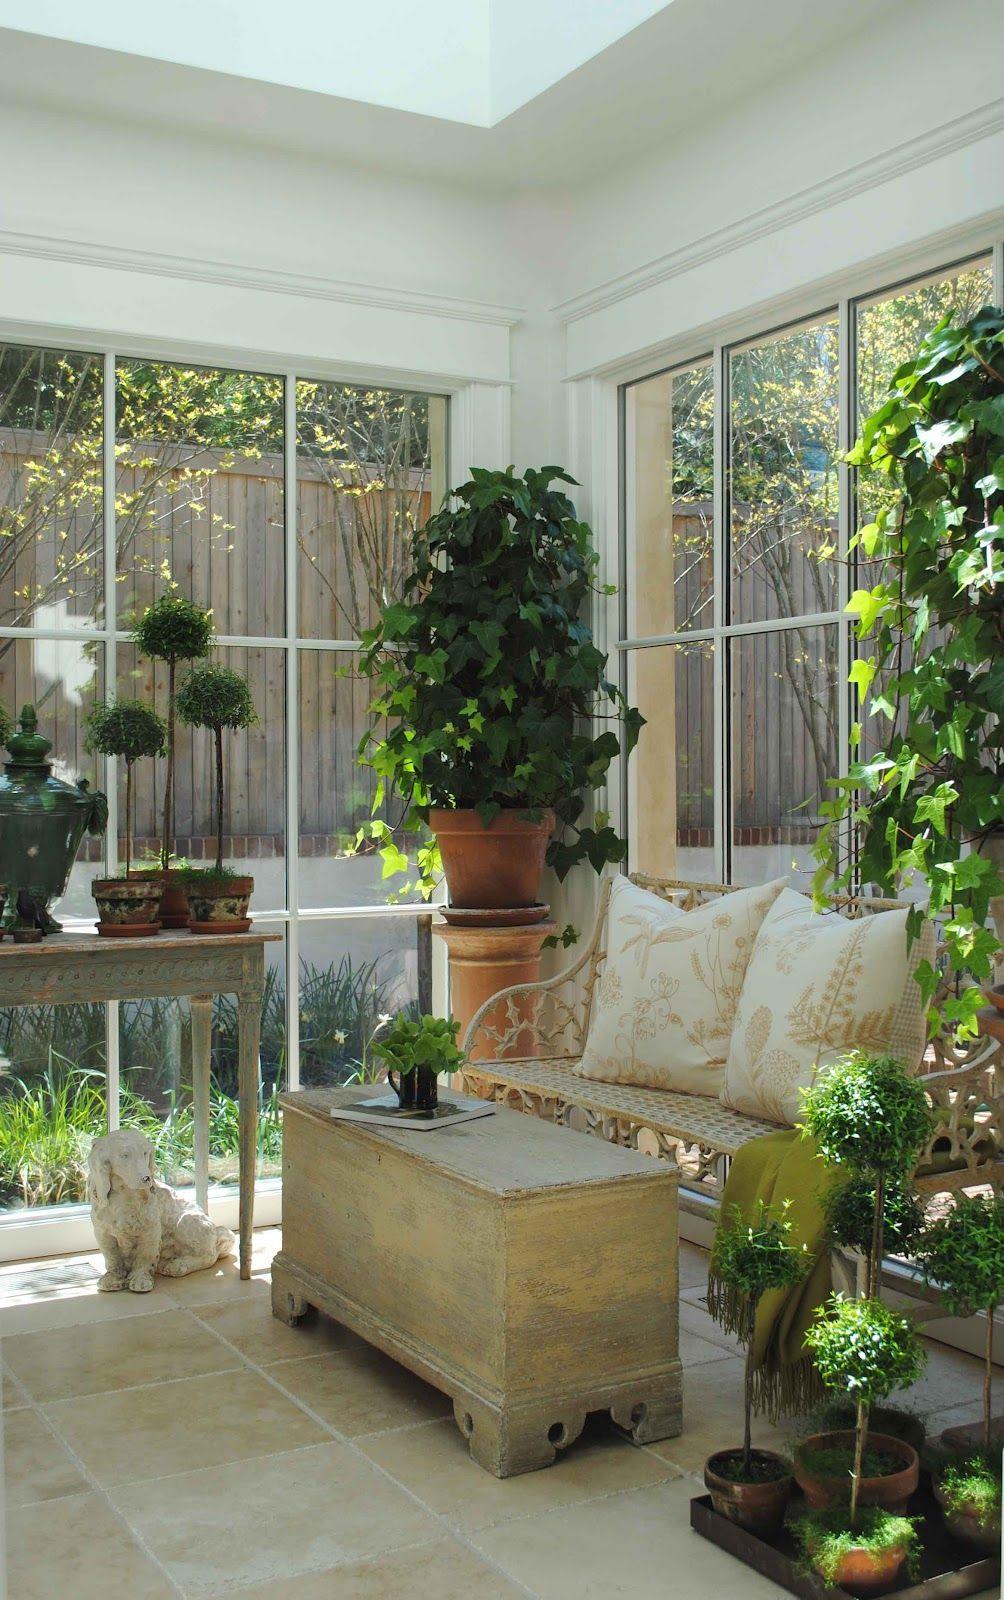 Sunroom I definitely want one or 2 in my dream home